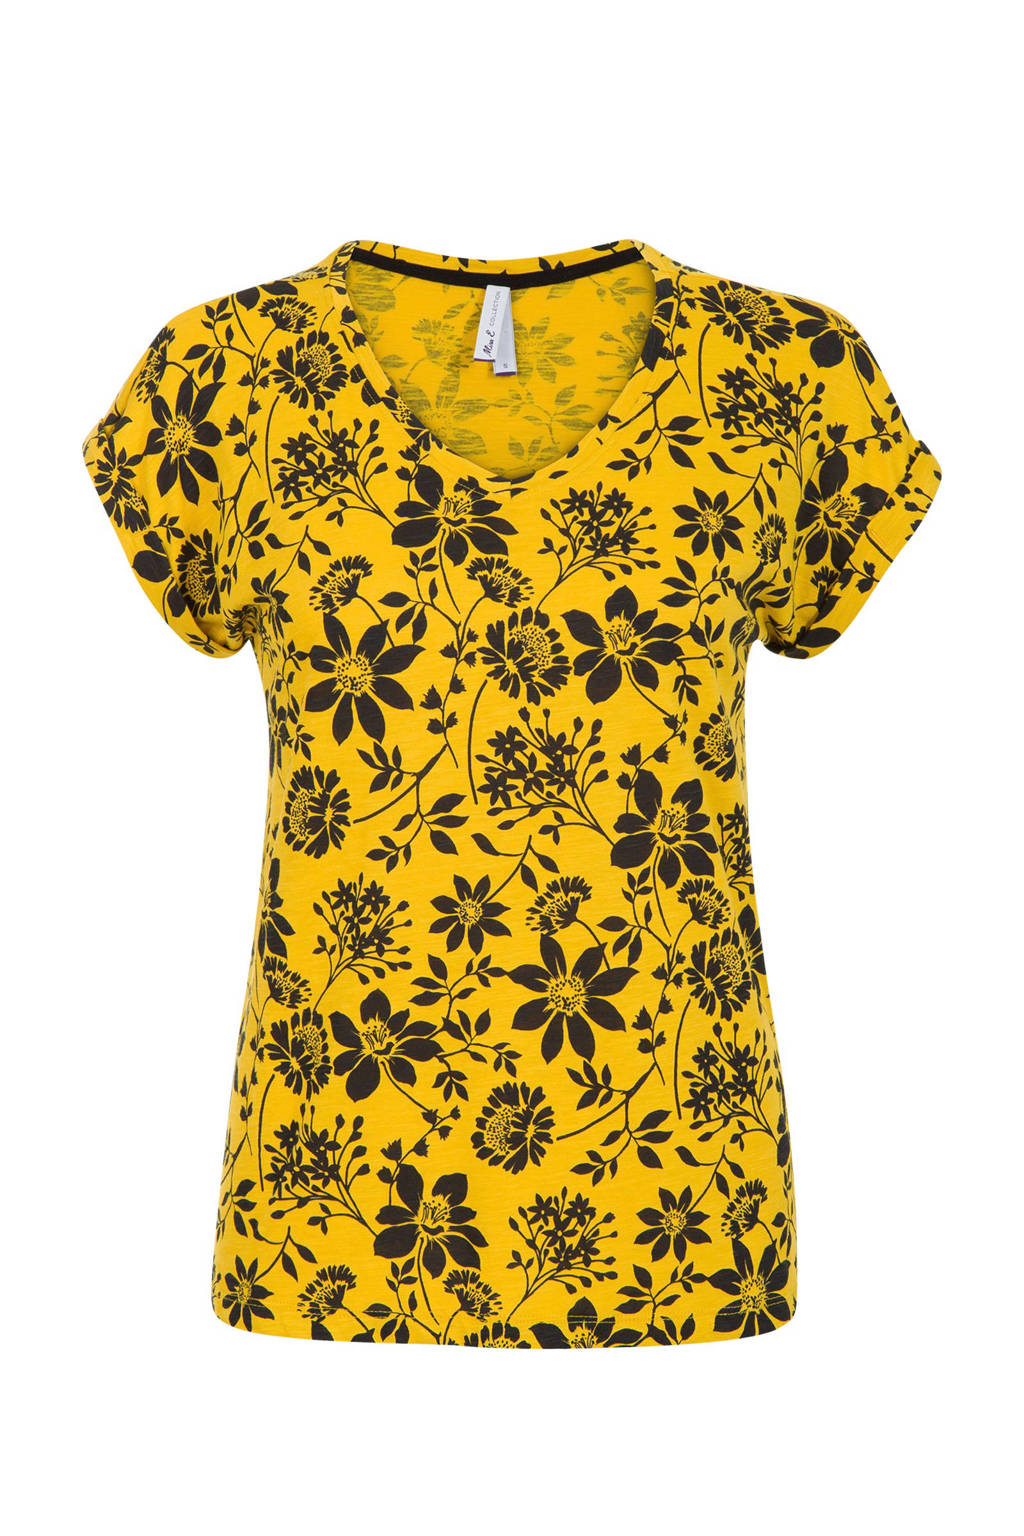 Miss Etam Regulier T-shirt met bloemenprint, Geel